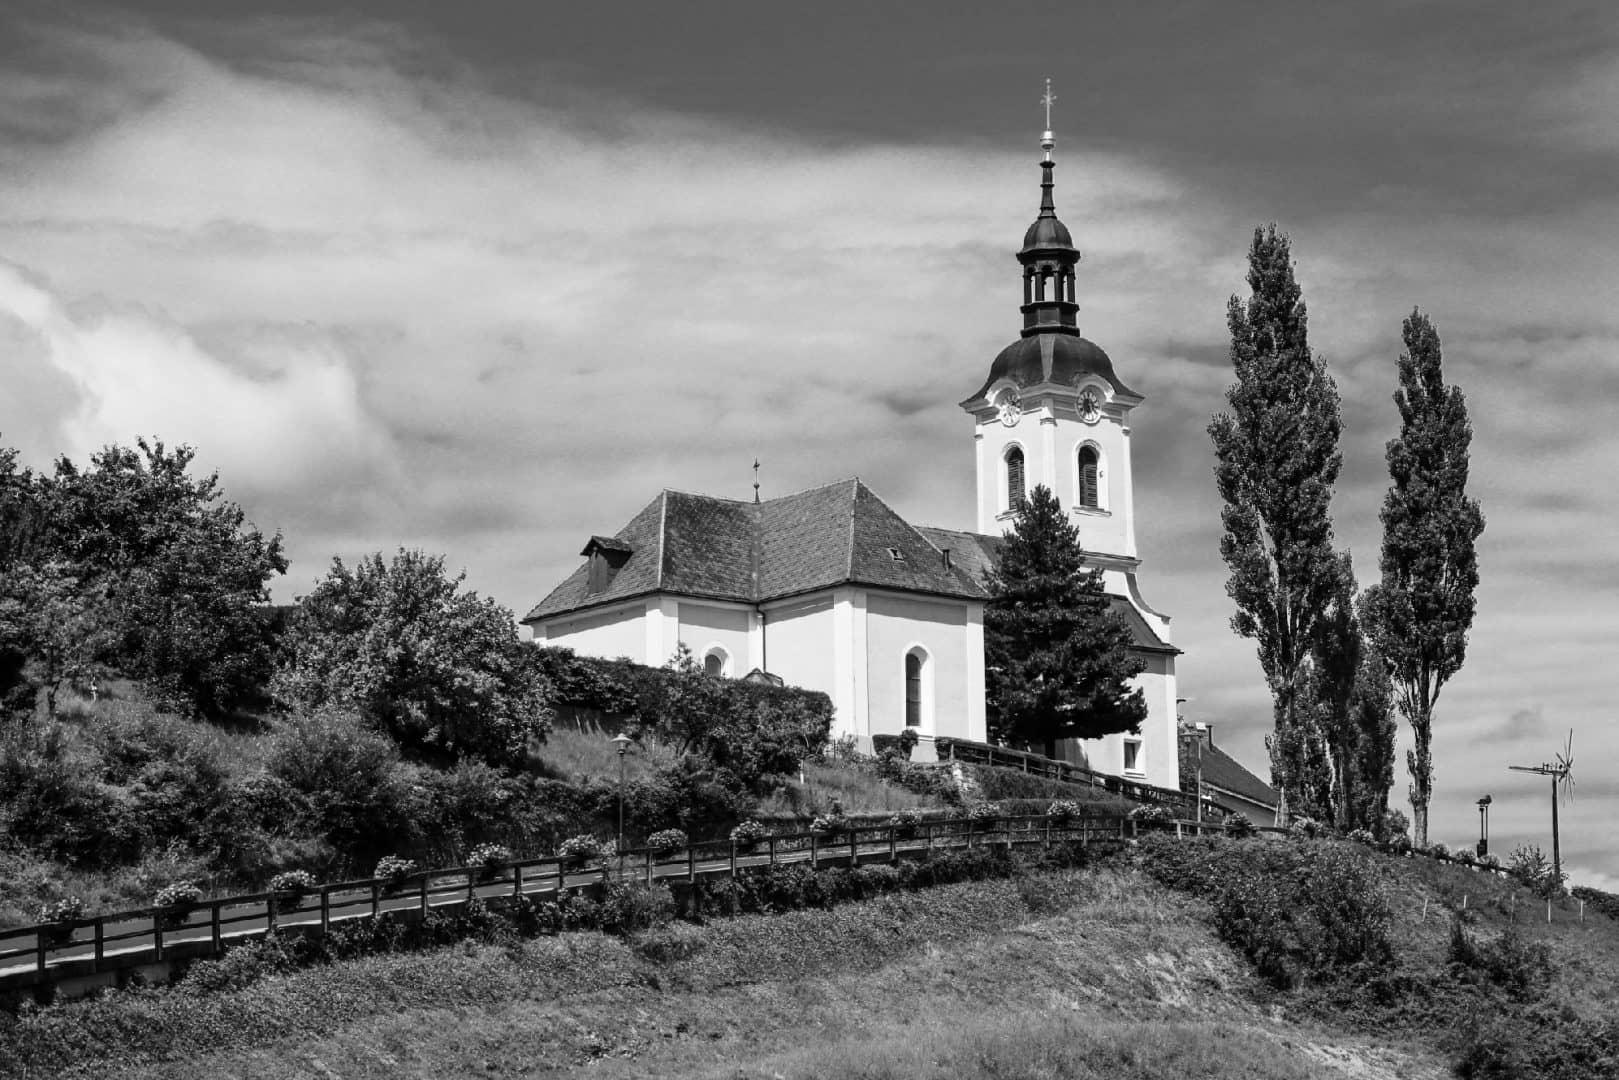 Pfarrkirche Kitzeck - Volker Birmann